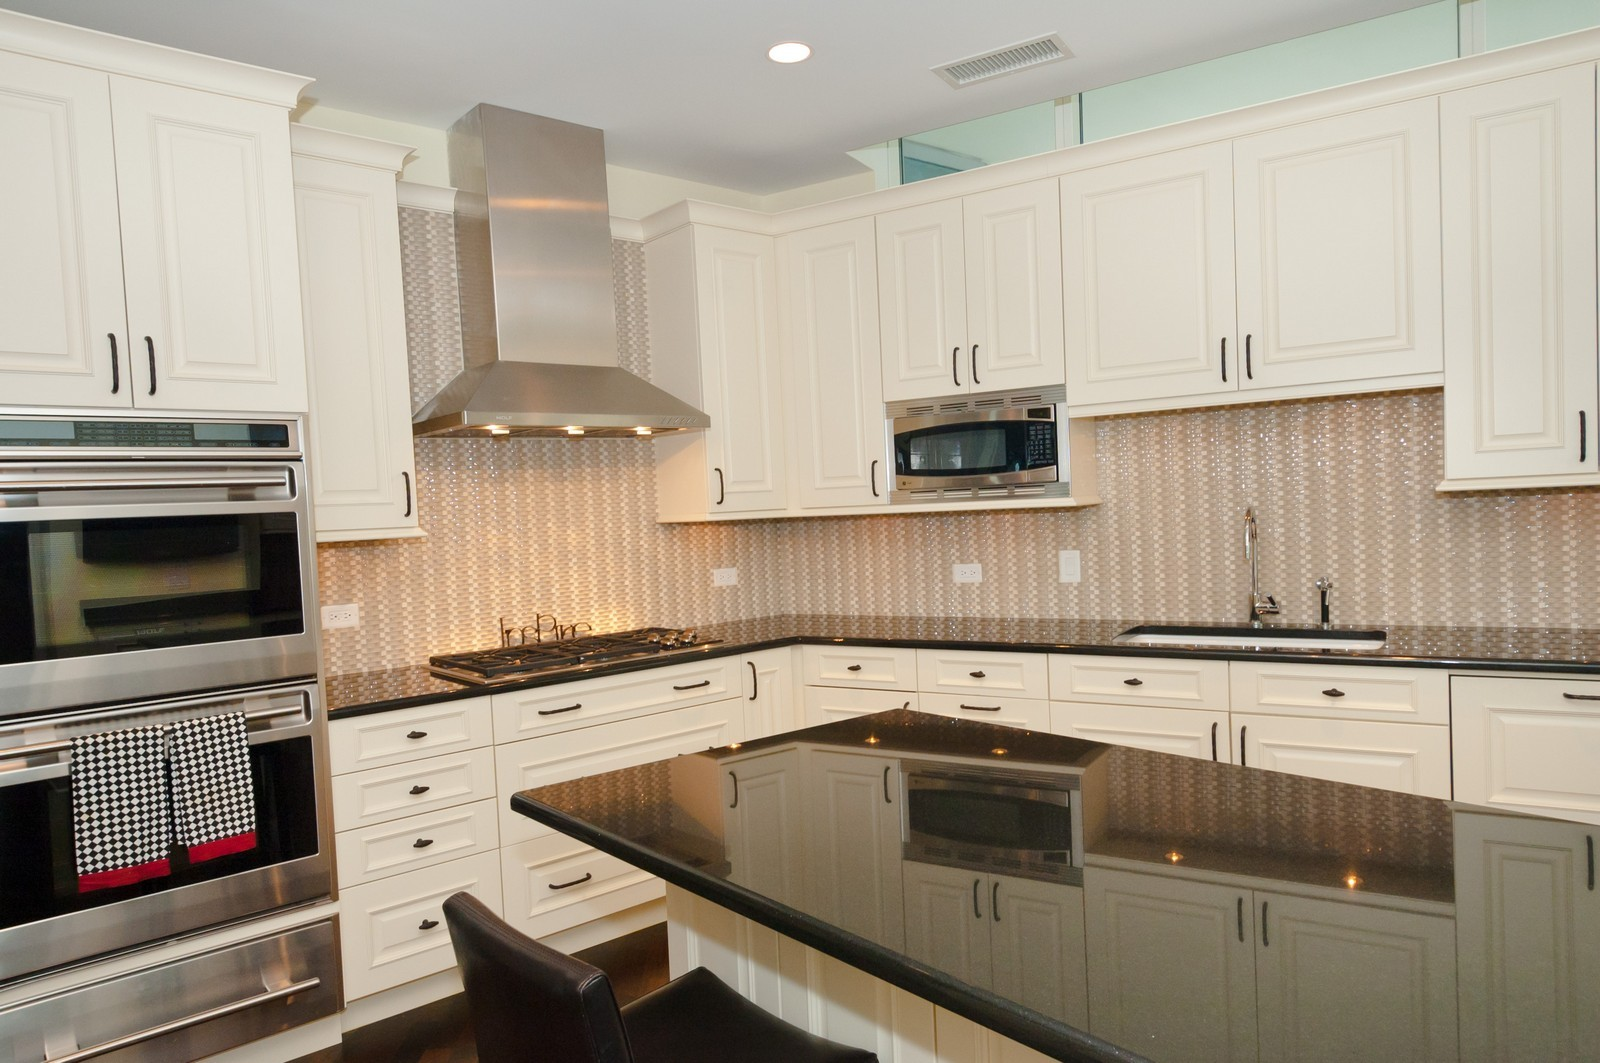 Real Estate Photography - 50 E. Chestnut, Apt 1001, Chicago, IL, 60611 - Kitchen 3